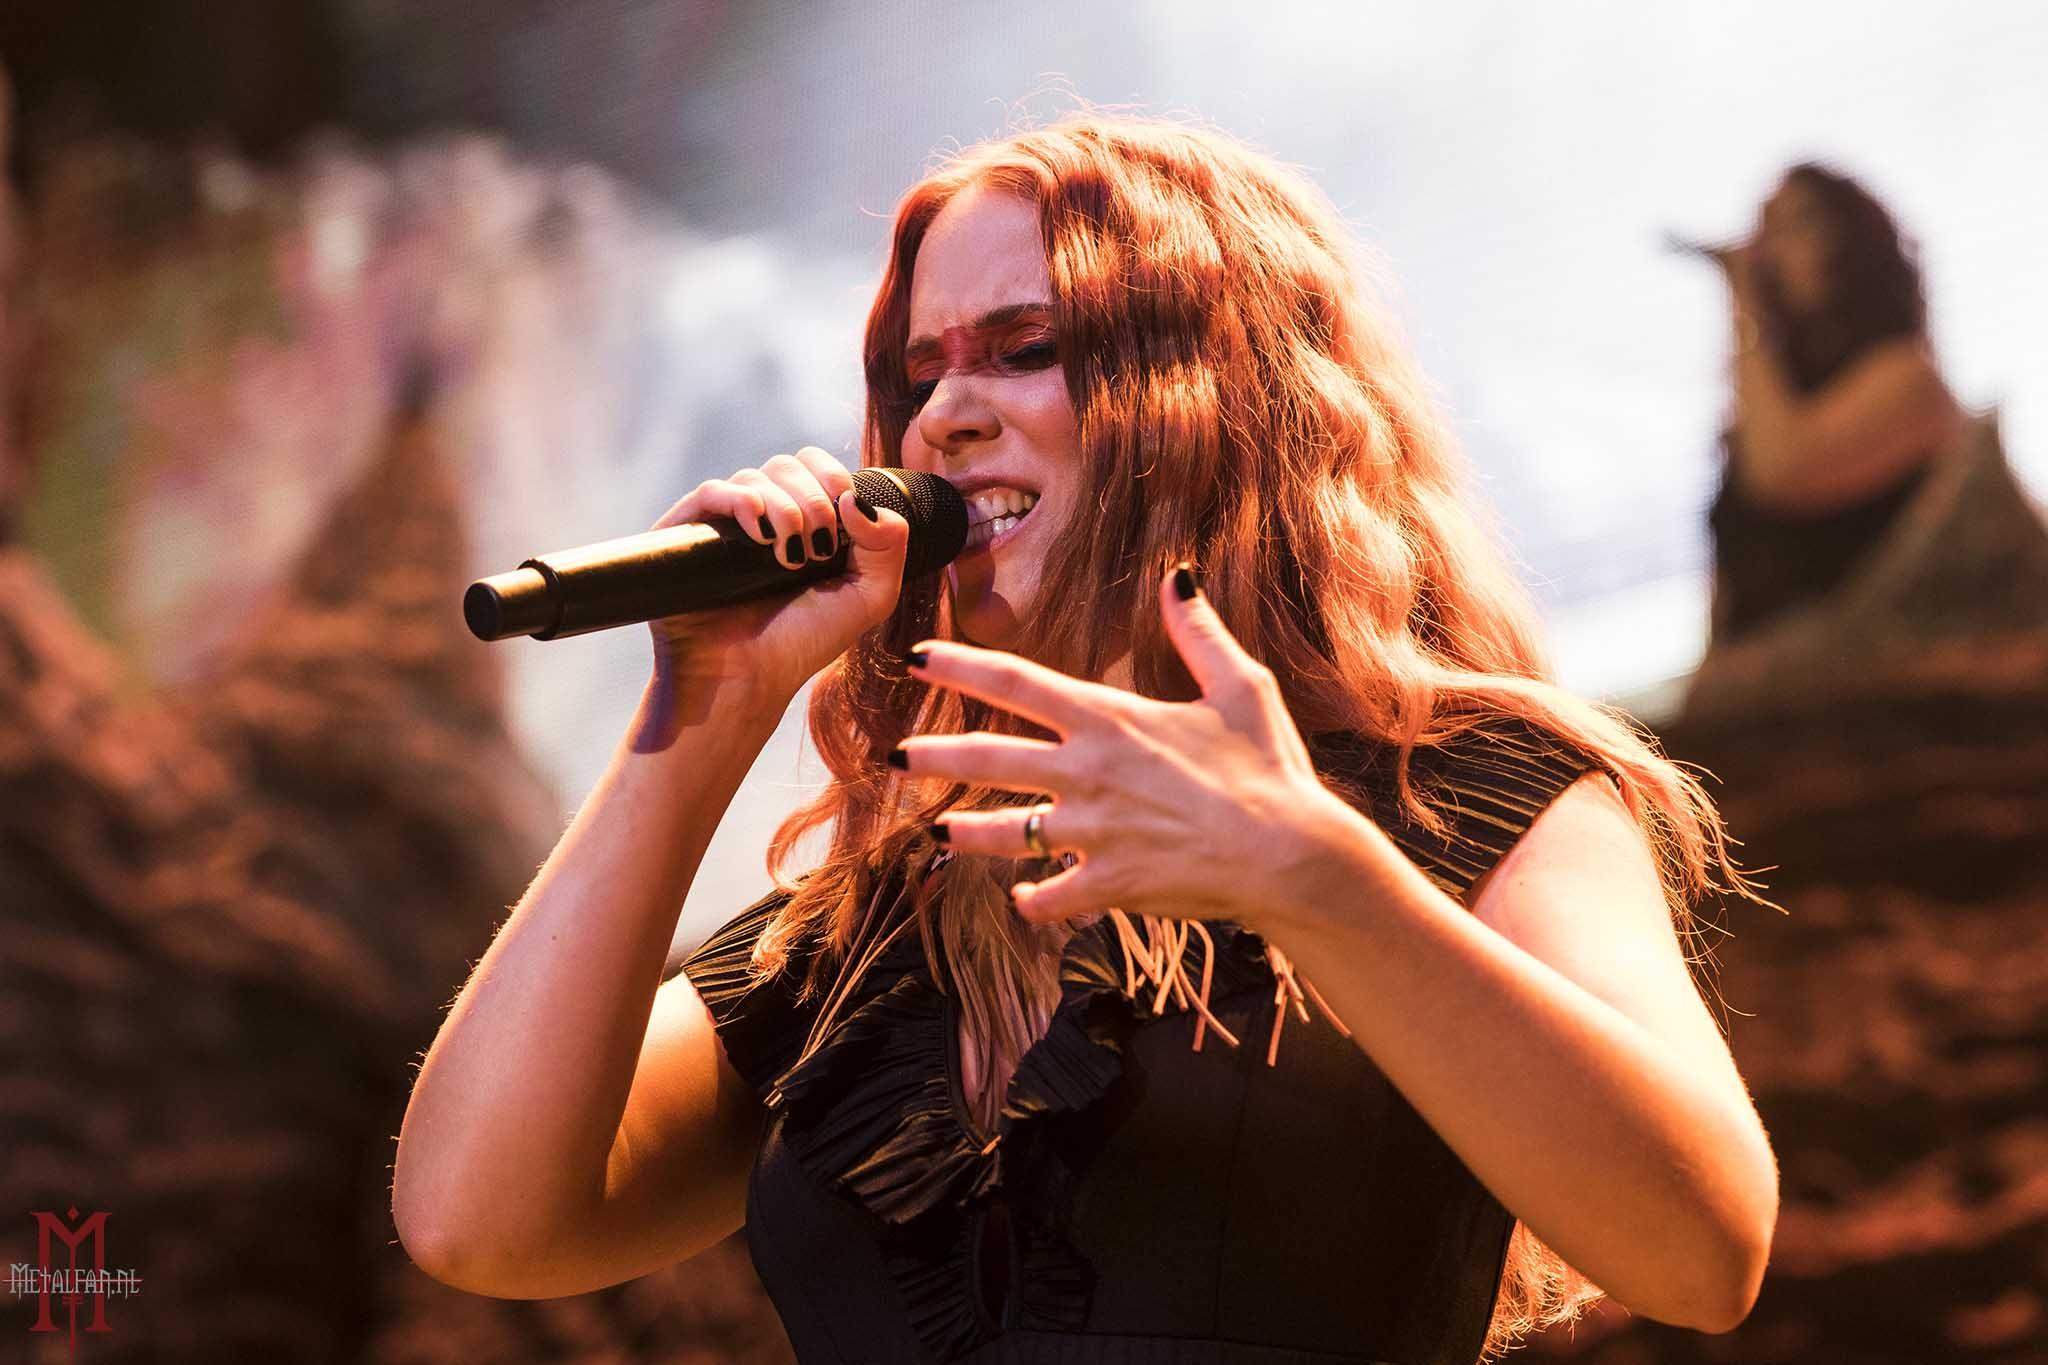 Simone Simons (Egyptian) @ Ayreon - Electric Castle Live and Other Tales, 14-9-2019, Tilburg